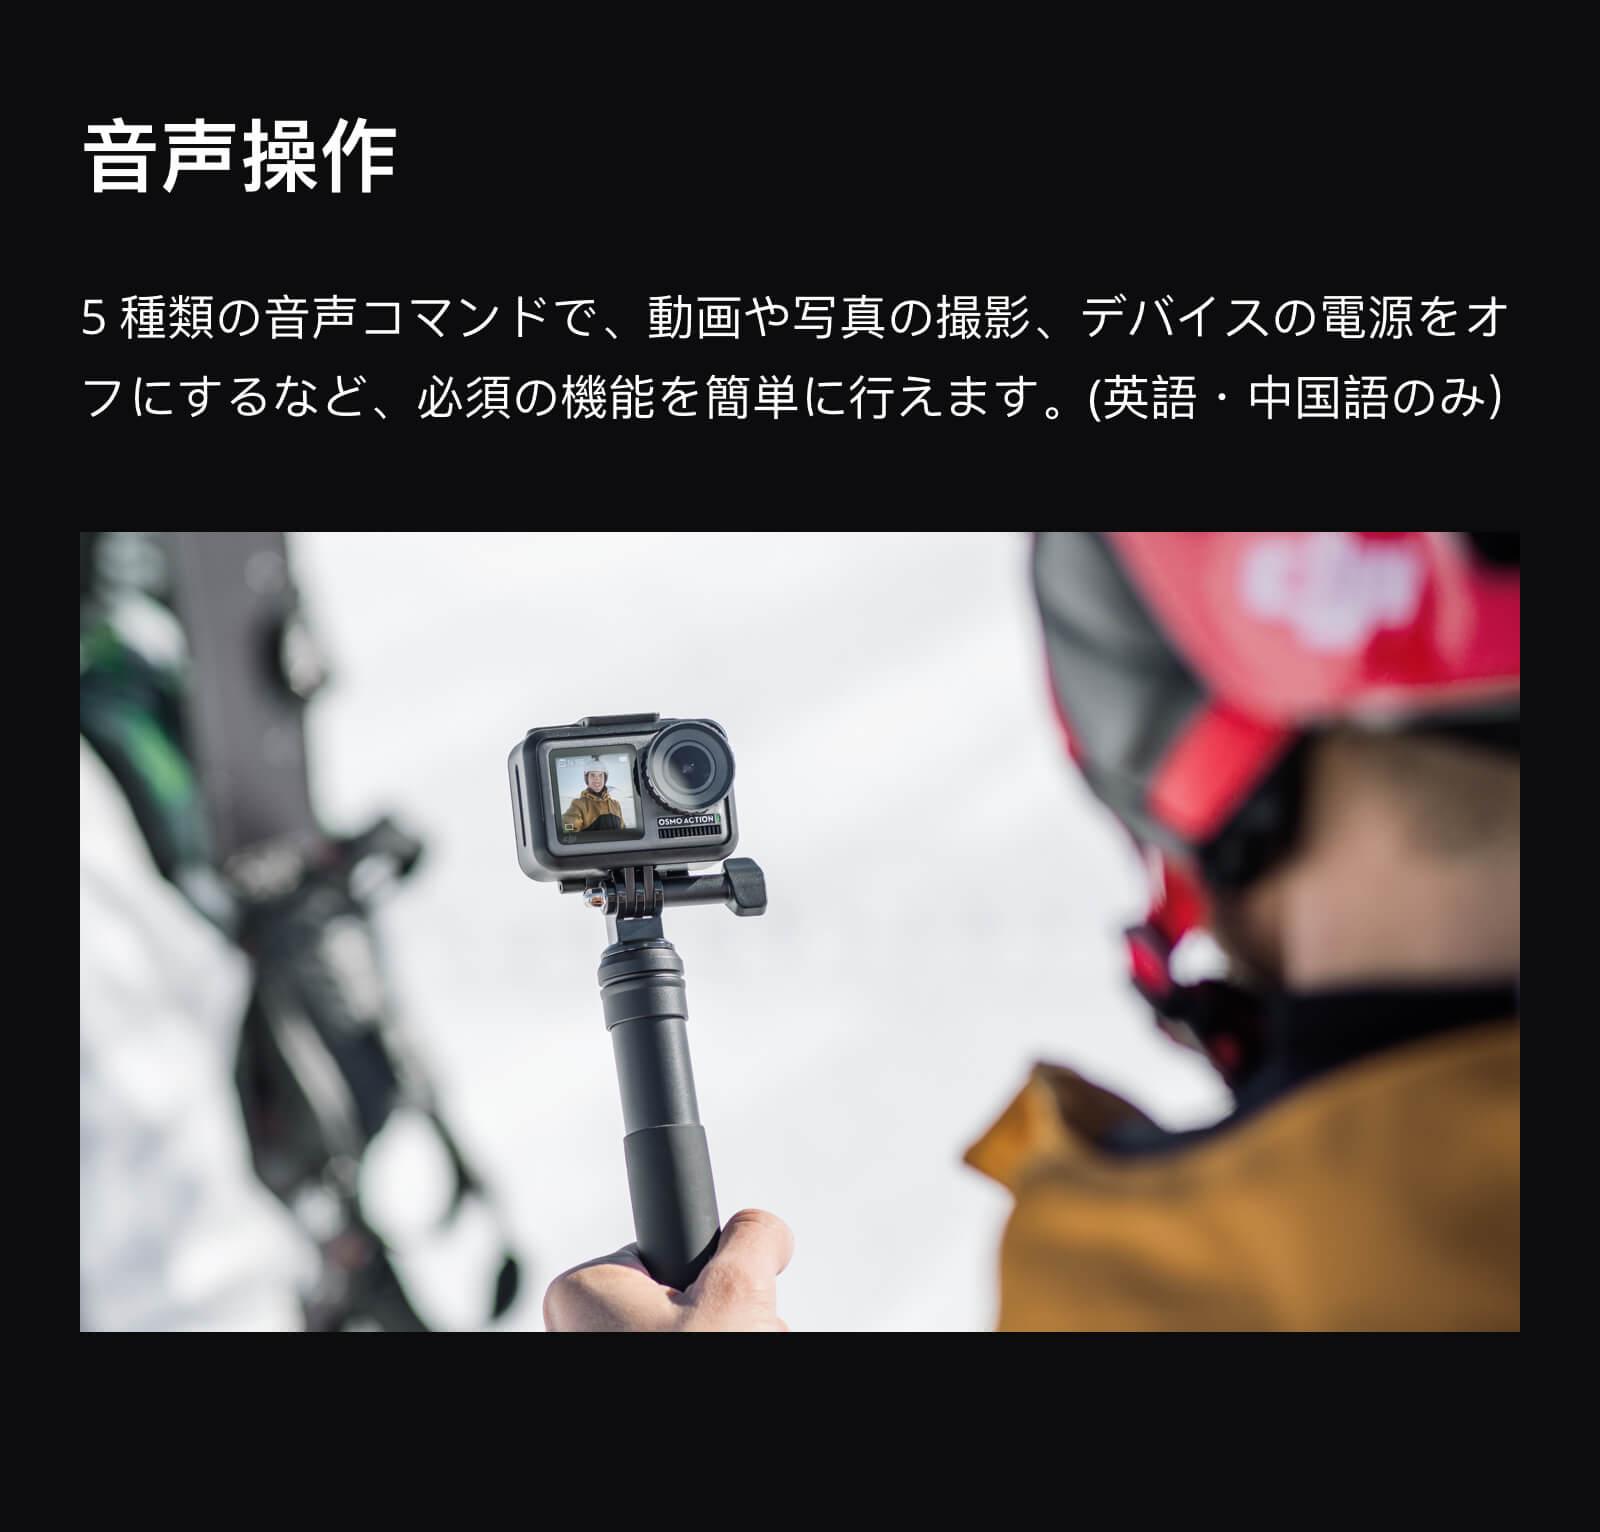 https://www.drone-station.net/images/DJI/osmoaction/13action.jpg